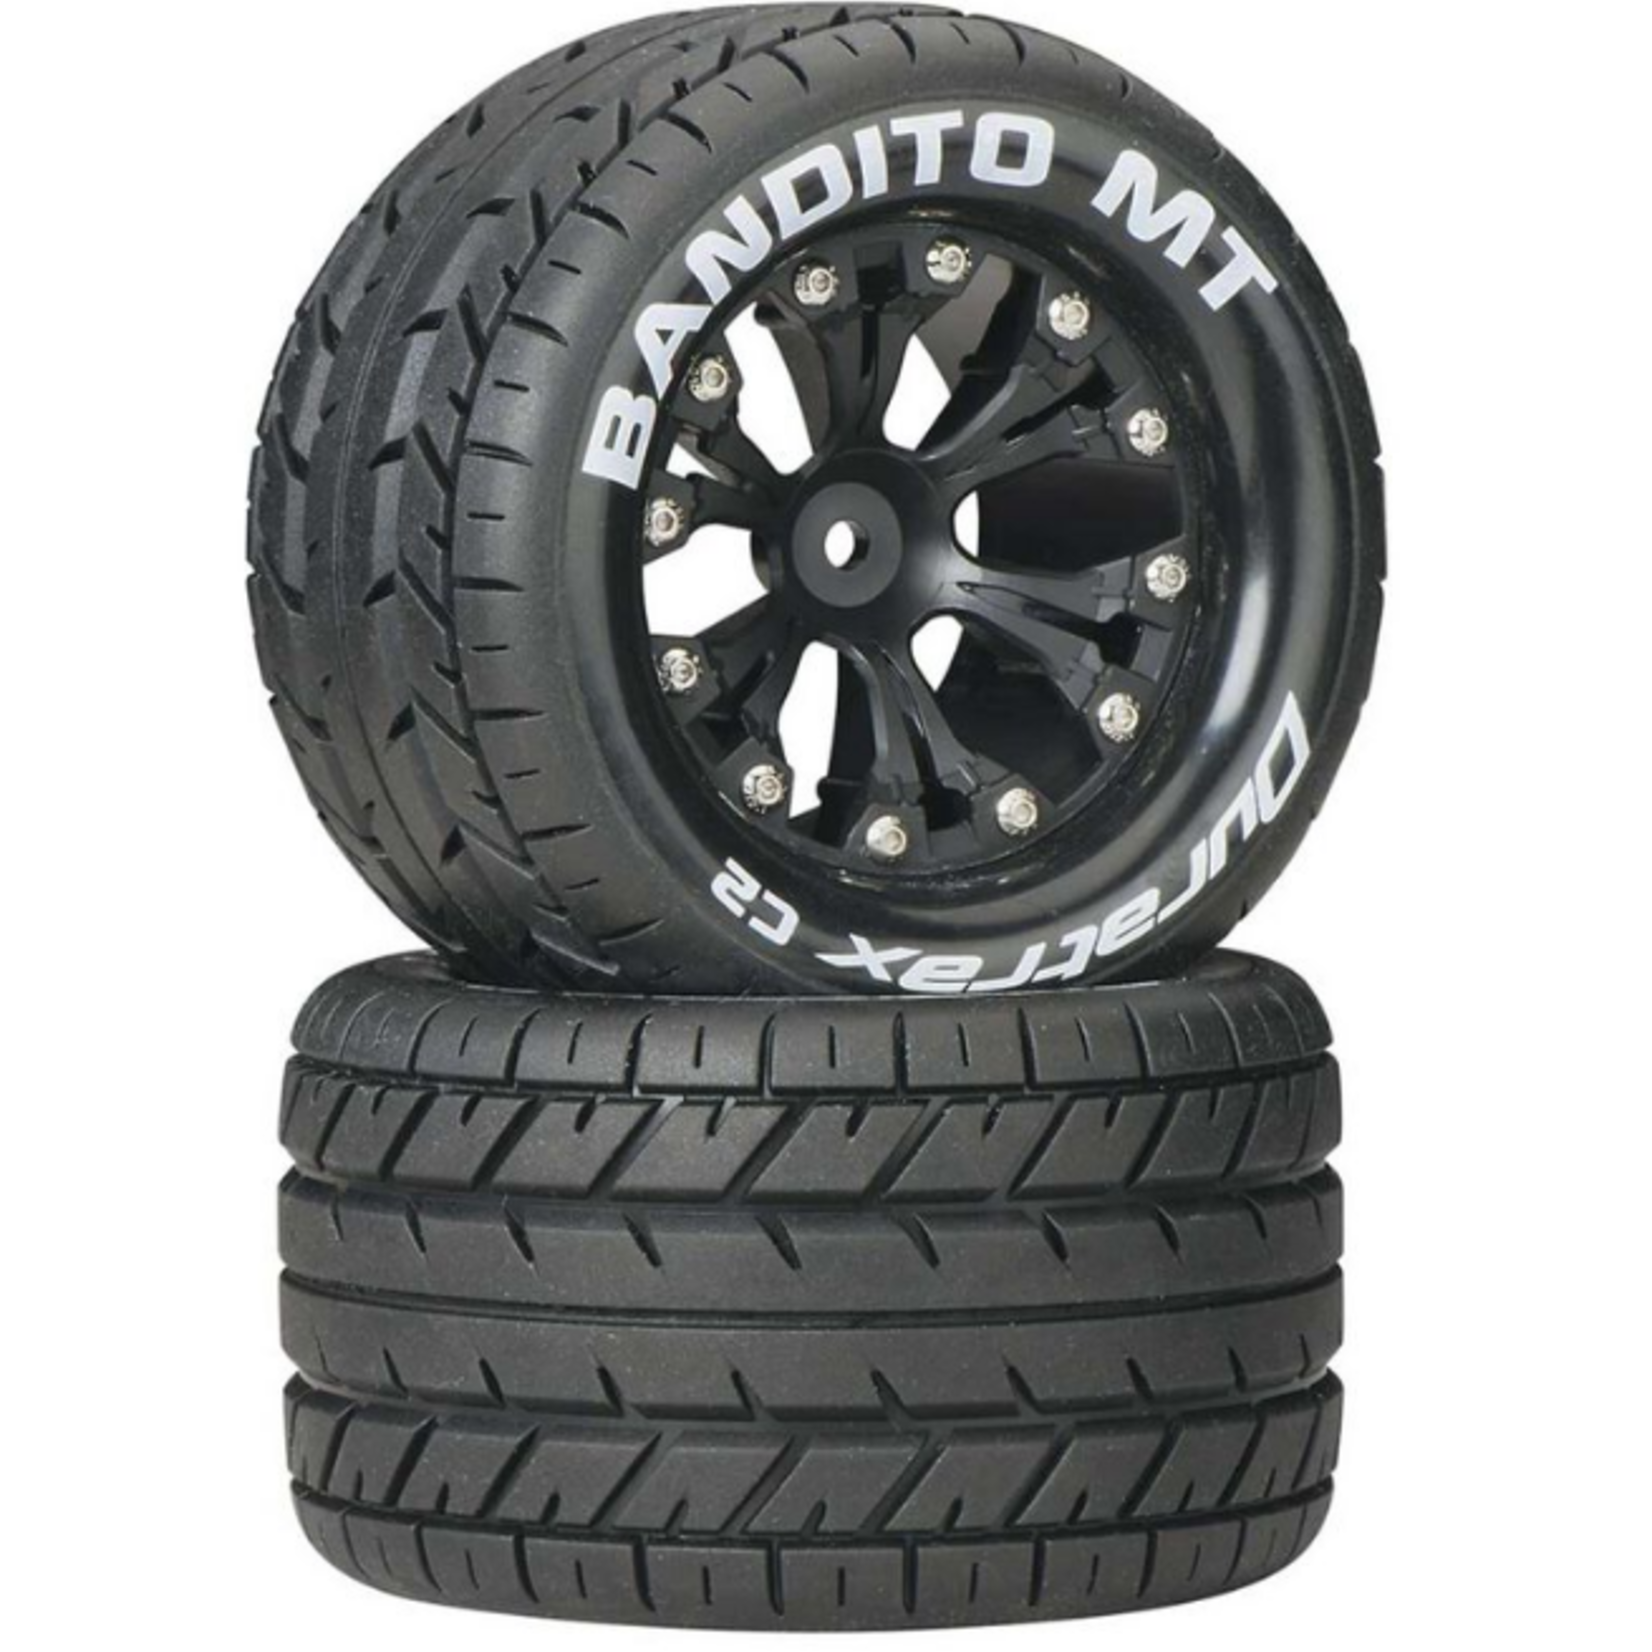 "Duratrax DTXC3502 Duratrax Bandito MT 2.8"" 2WD Mounted Rear C2 Black (2)"